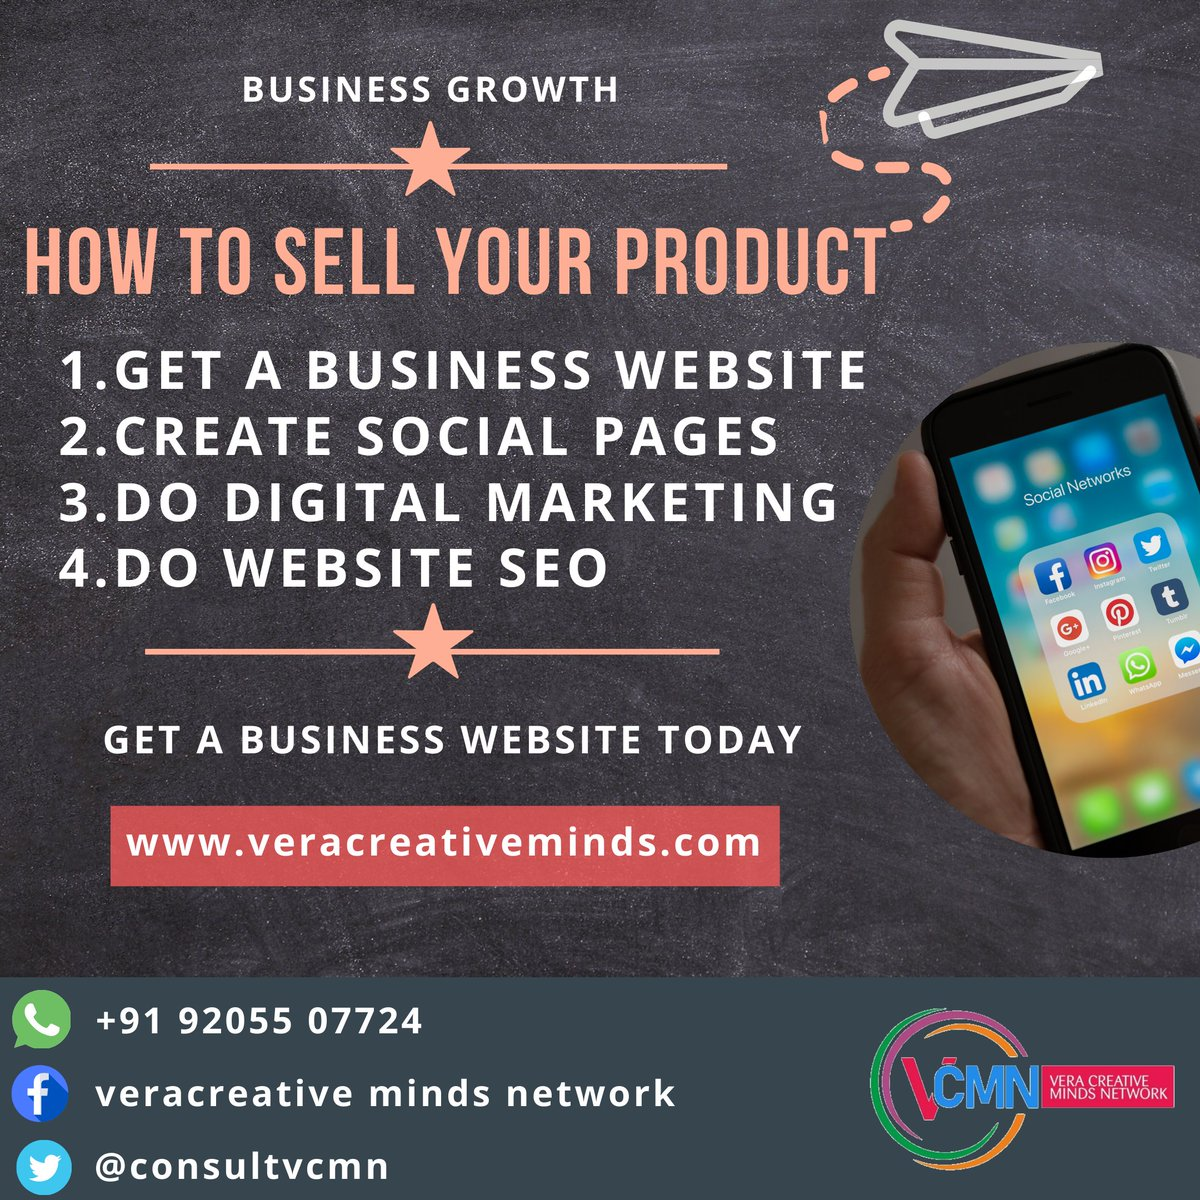 Get in touch for all your Website and Digital Marketing needs  Whatsapp on: +91 92055 07724  http://www.veracreativeminds.com  #GhanaStartups #onlinebusiness #socialmedia #salesstrategies #websitedevelopment #websitedesign #digitalmarketing #seo #socialmediapic.twitter.com/qUDPMgrHO1